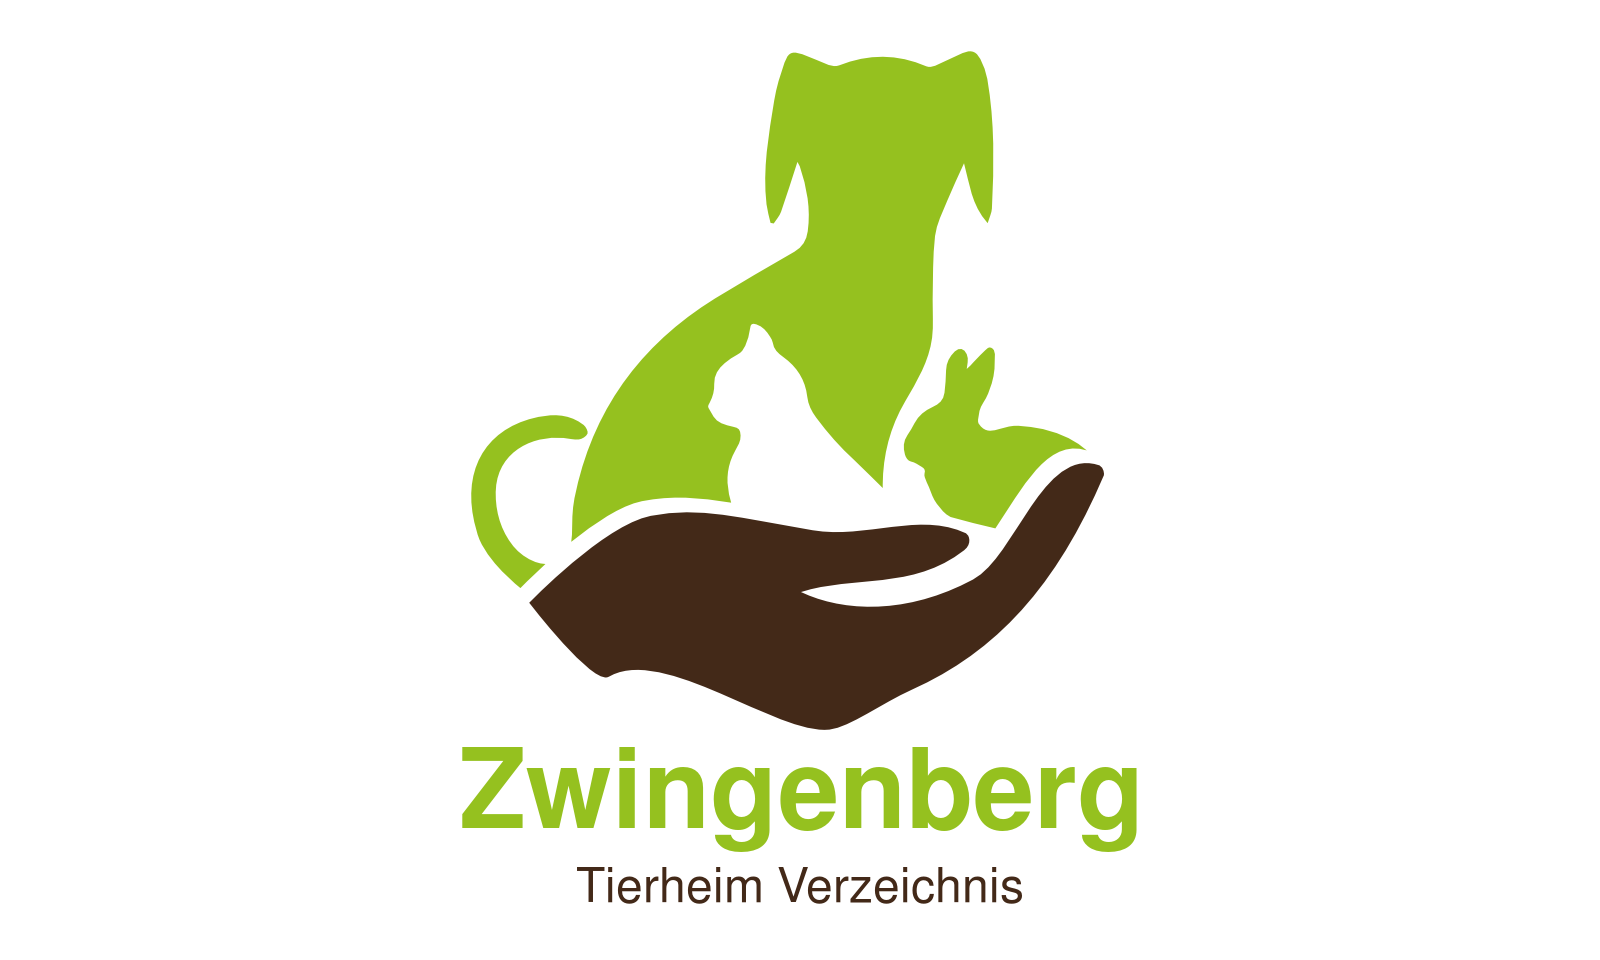 Tierheim Zwingenberg